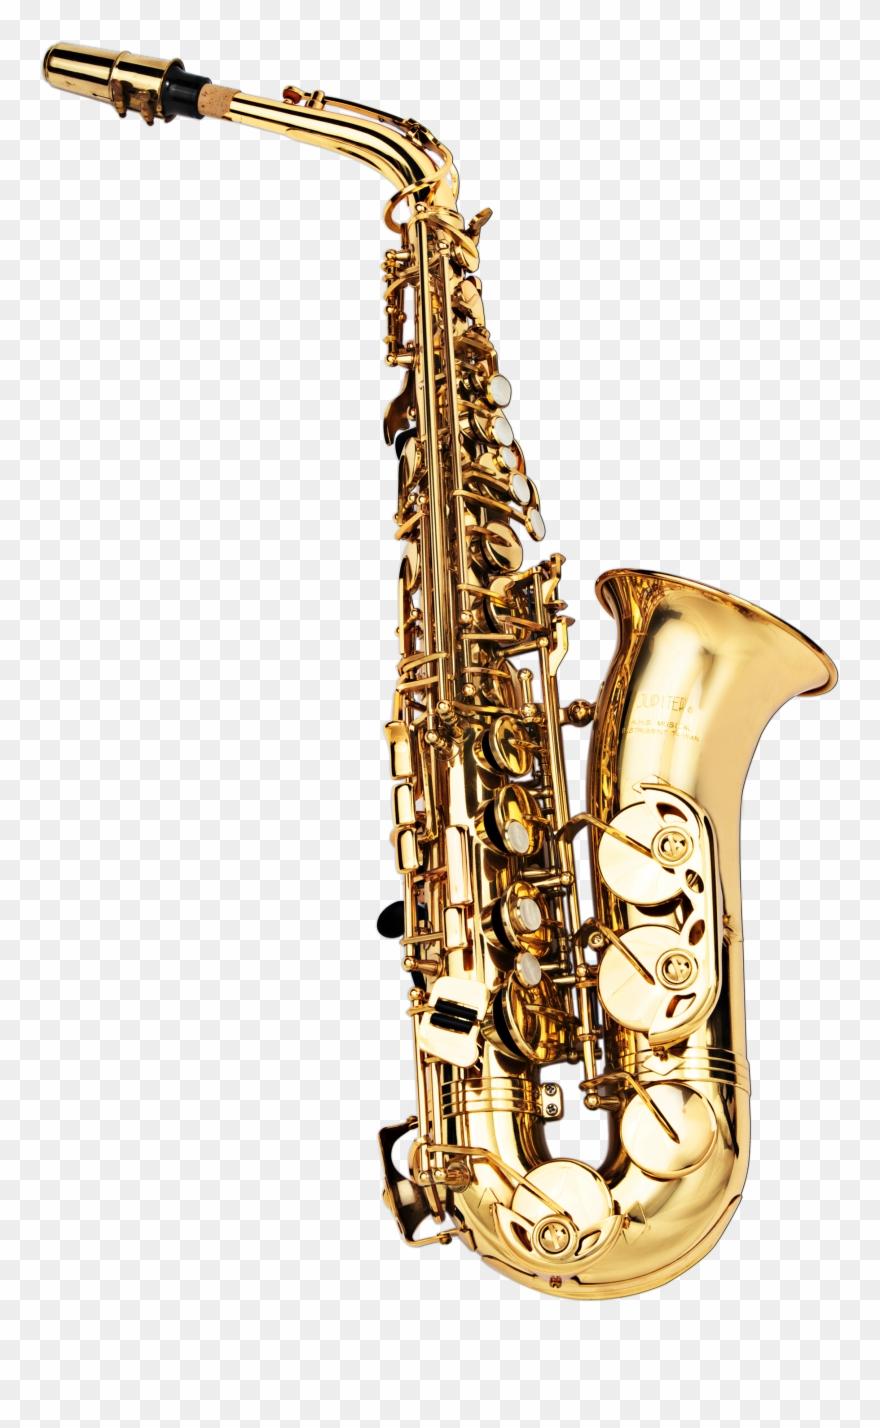 Saxophone Png Transparent Images.